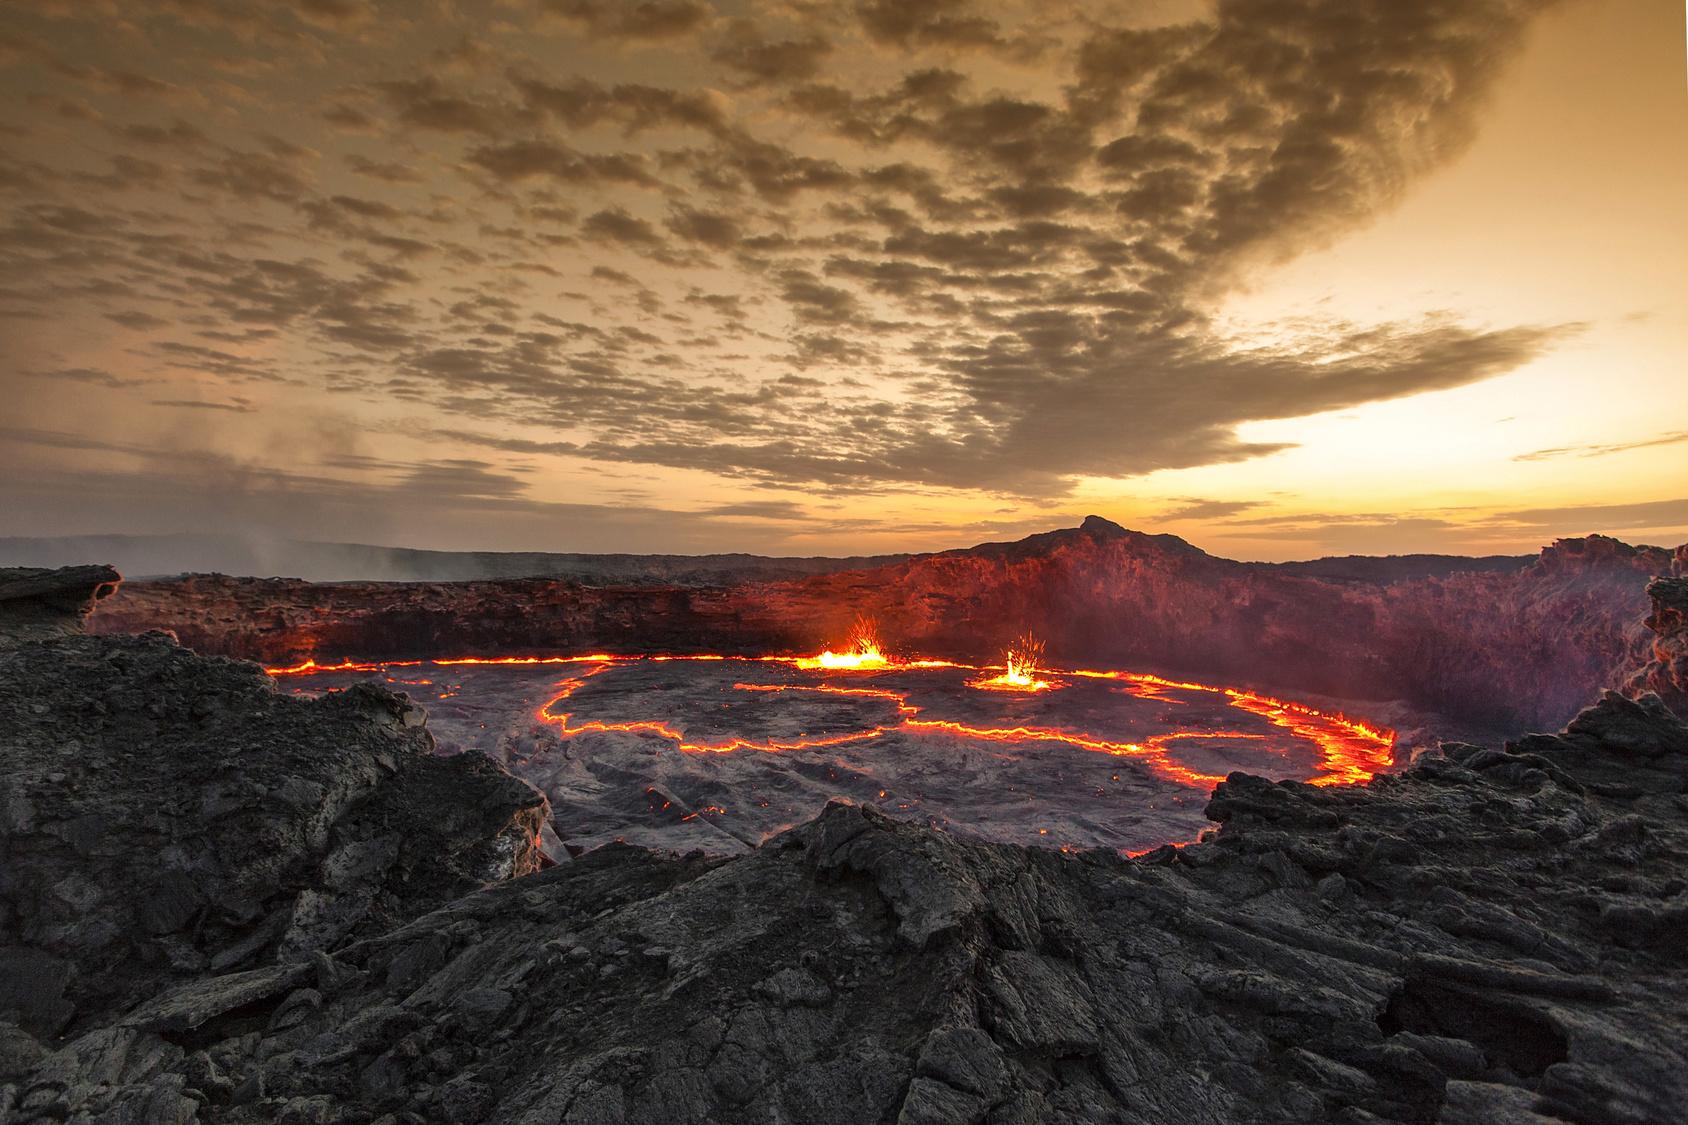 Riccardo Spatolisano: Viaggio fotografico in Dancalia – Etiopia dal 20-01-2018 al 29-01-2018